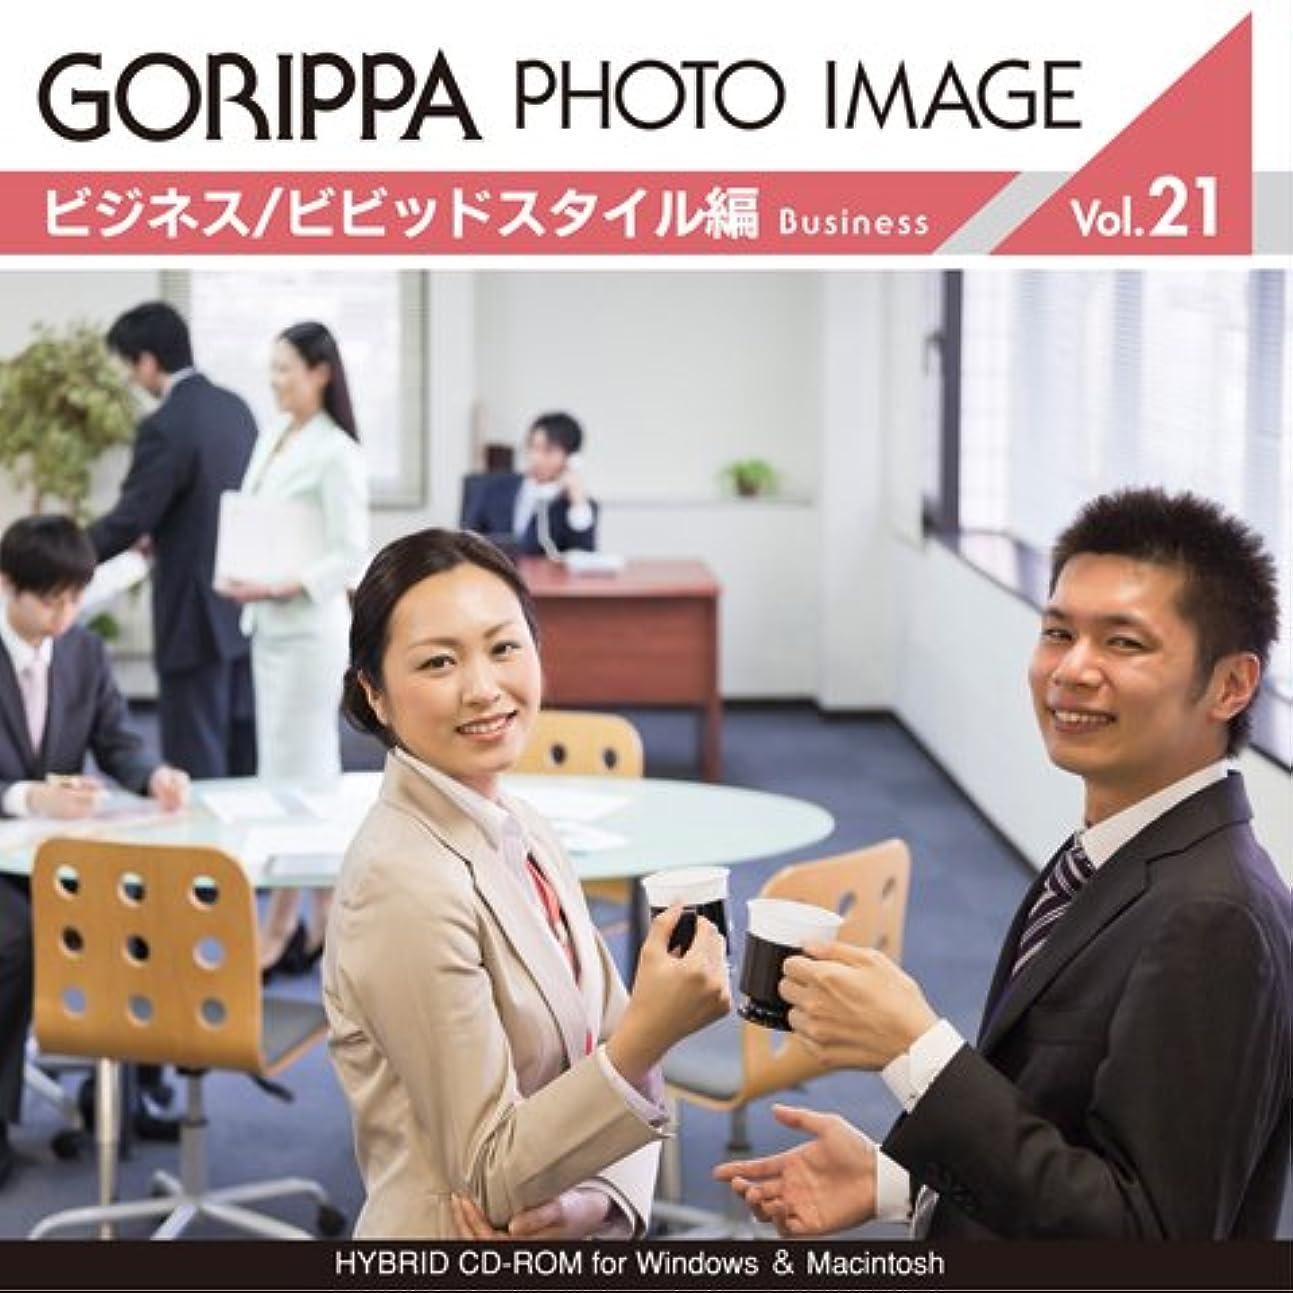 GORIPPA PHOTO IMAGE vol.21?ビジネス/ビビッドスタイル編?